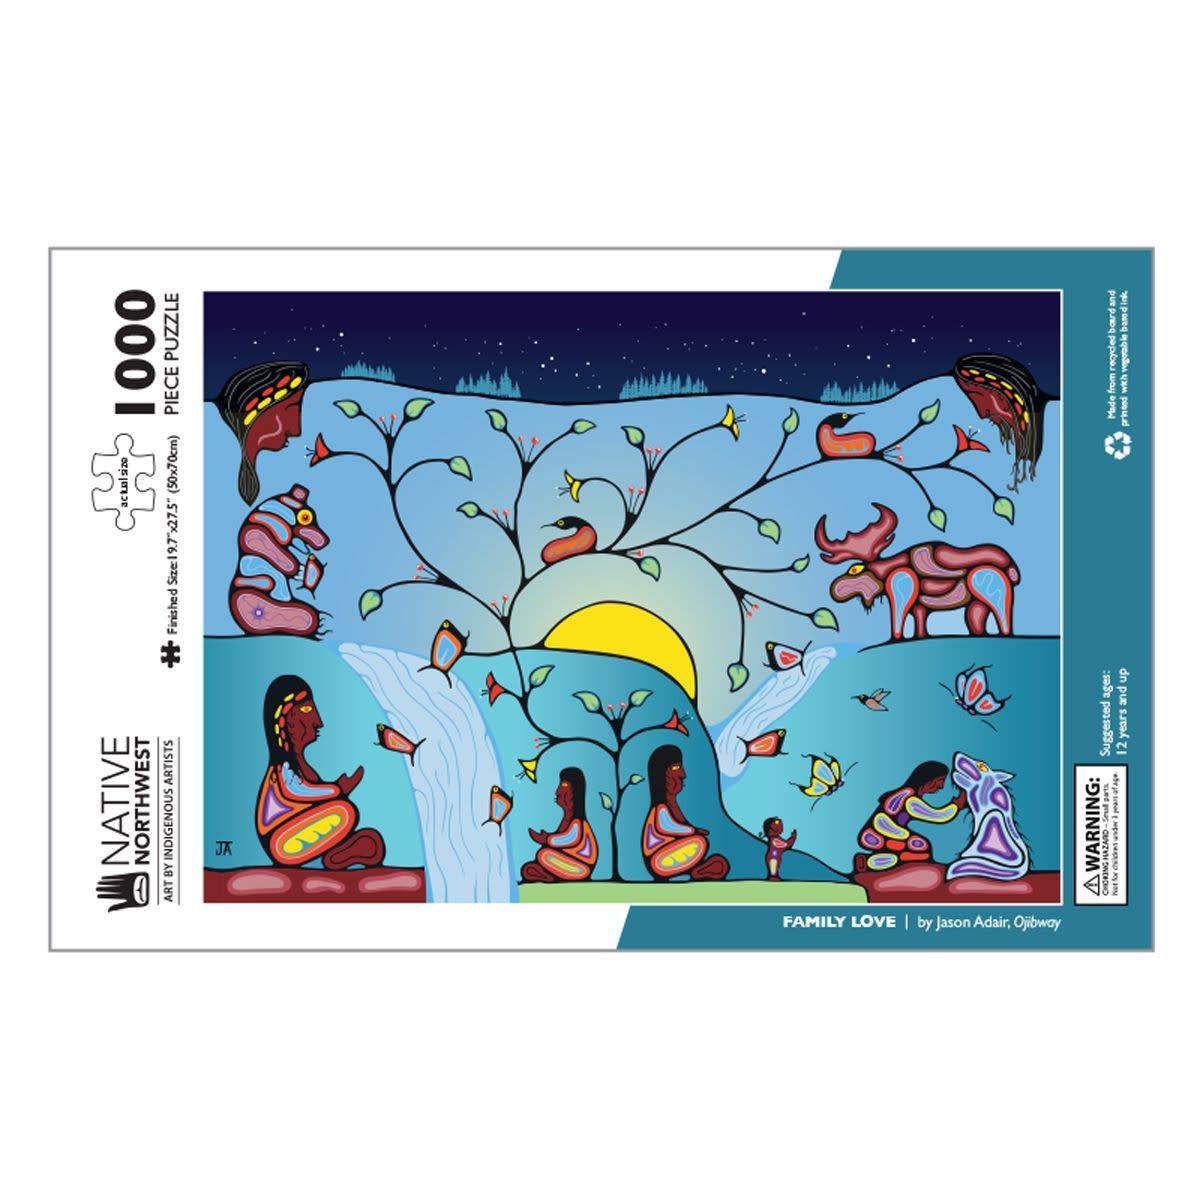 1000 pcs Puzzle - Family Love by Jason Adair-1